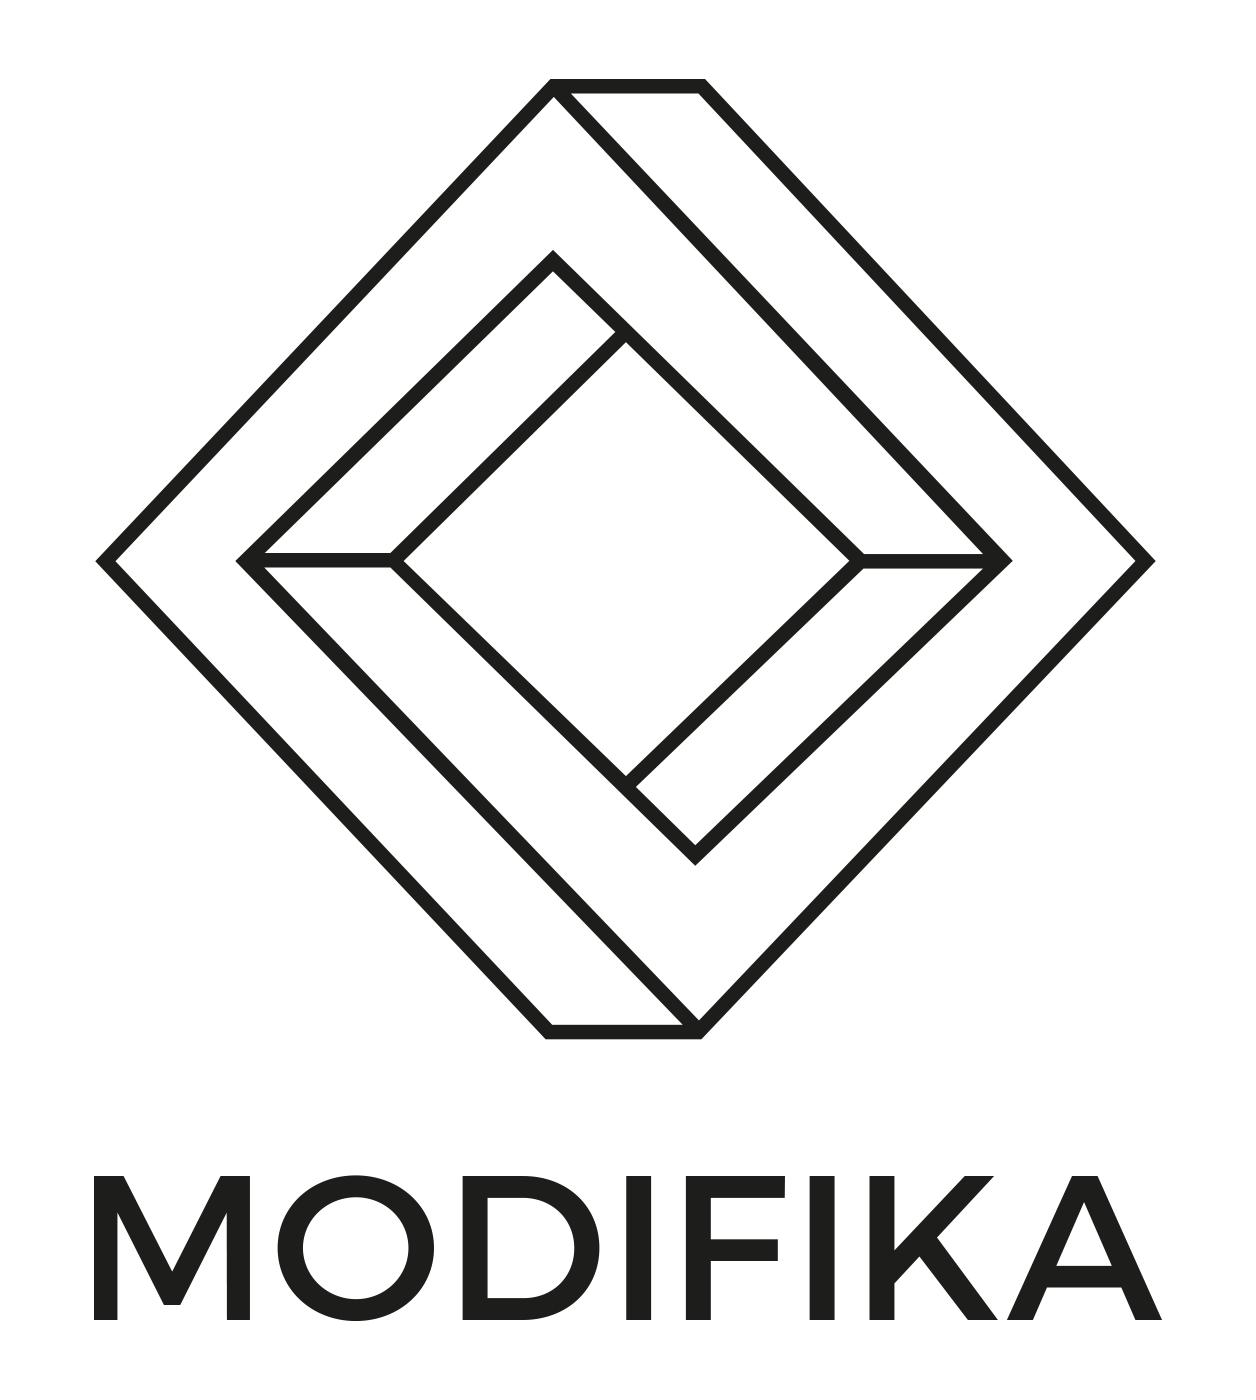 MODIFIKA